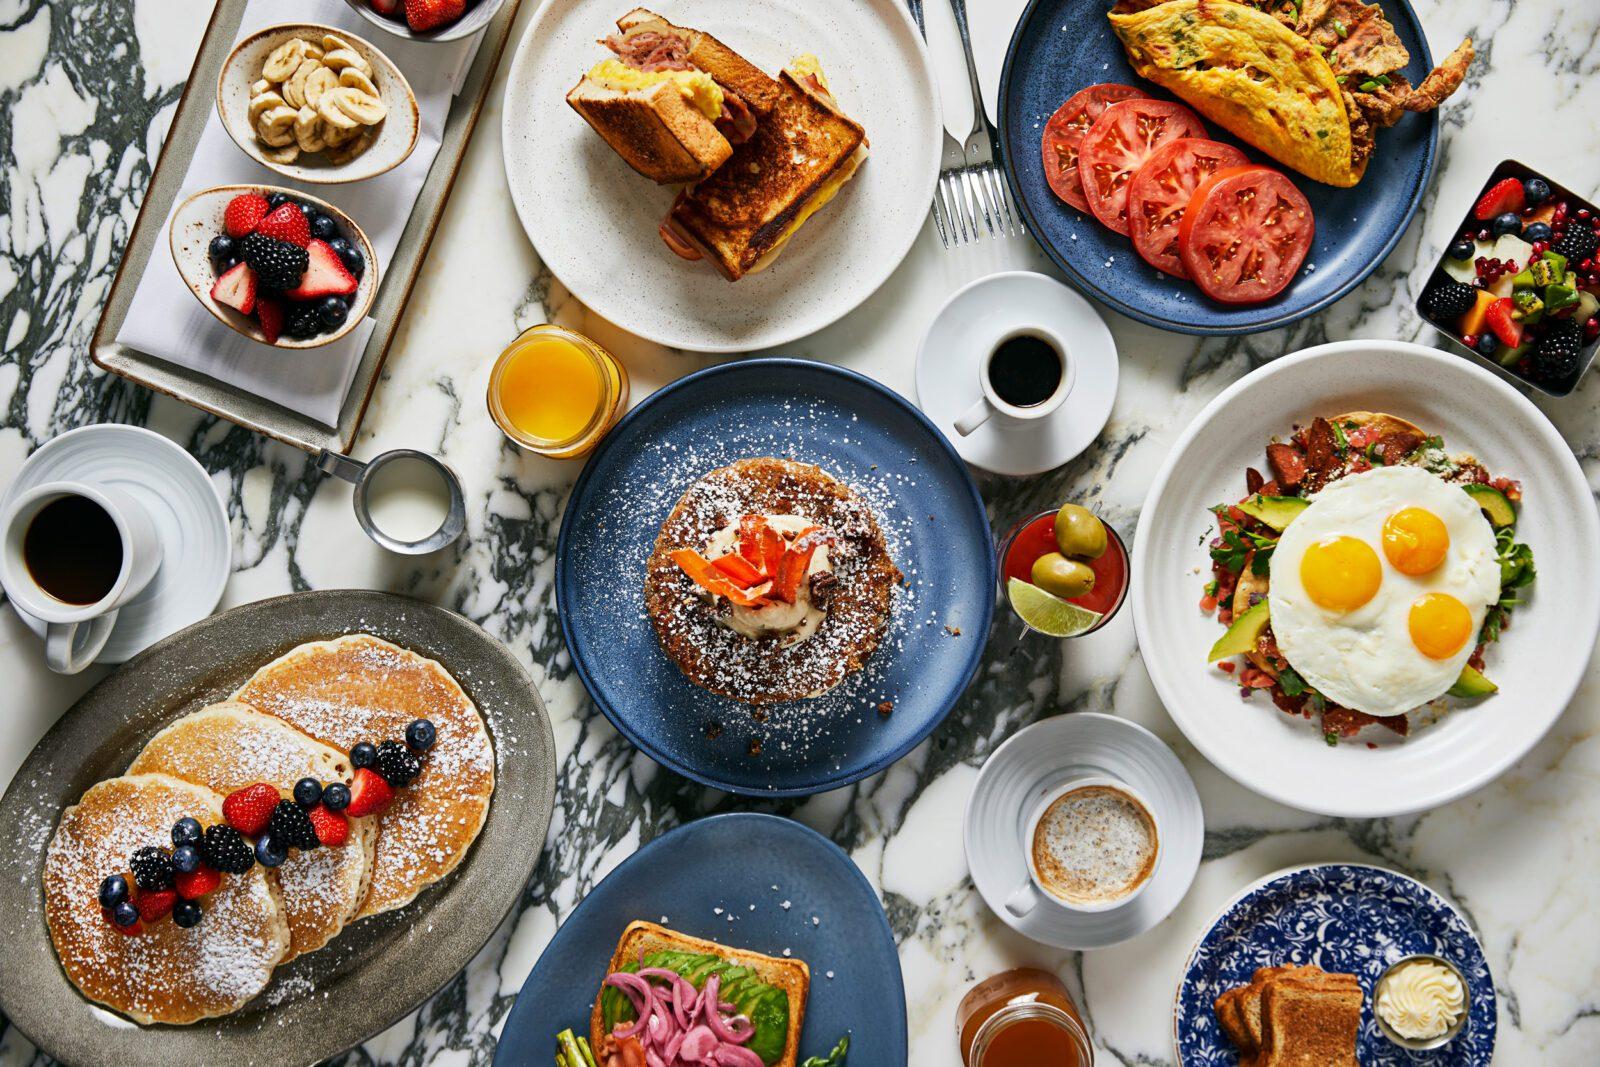 Cafe Americano Breakfast Group